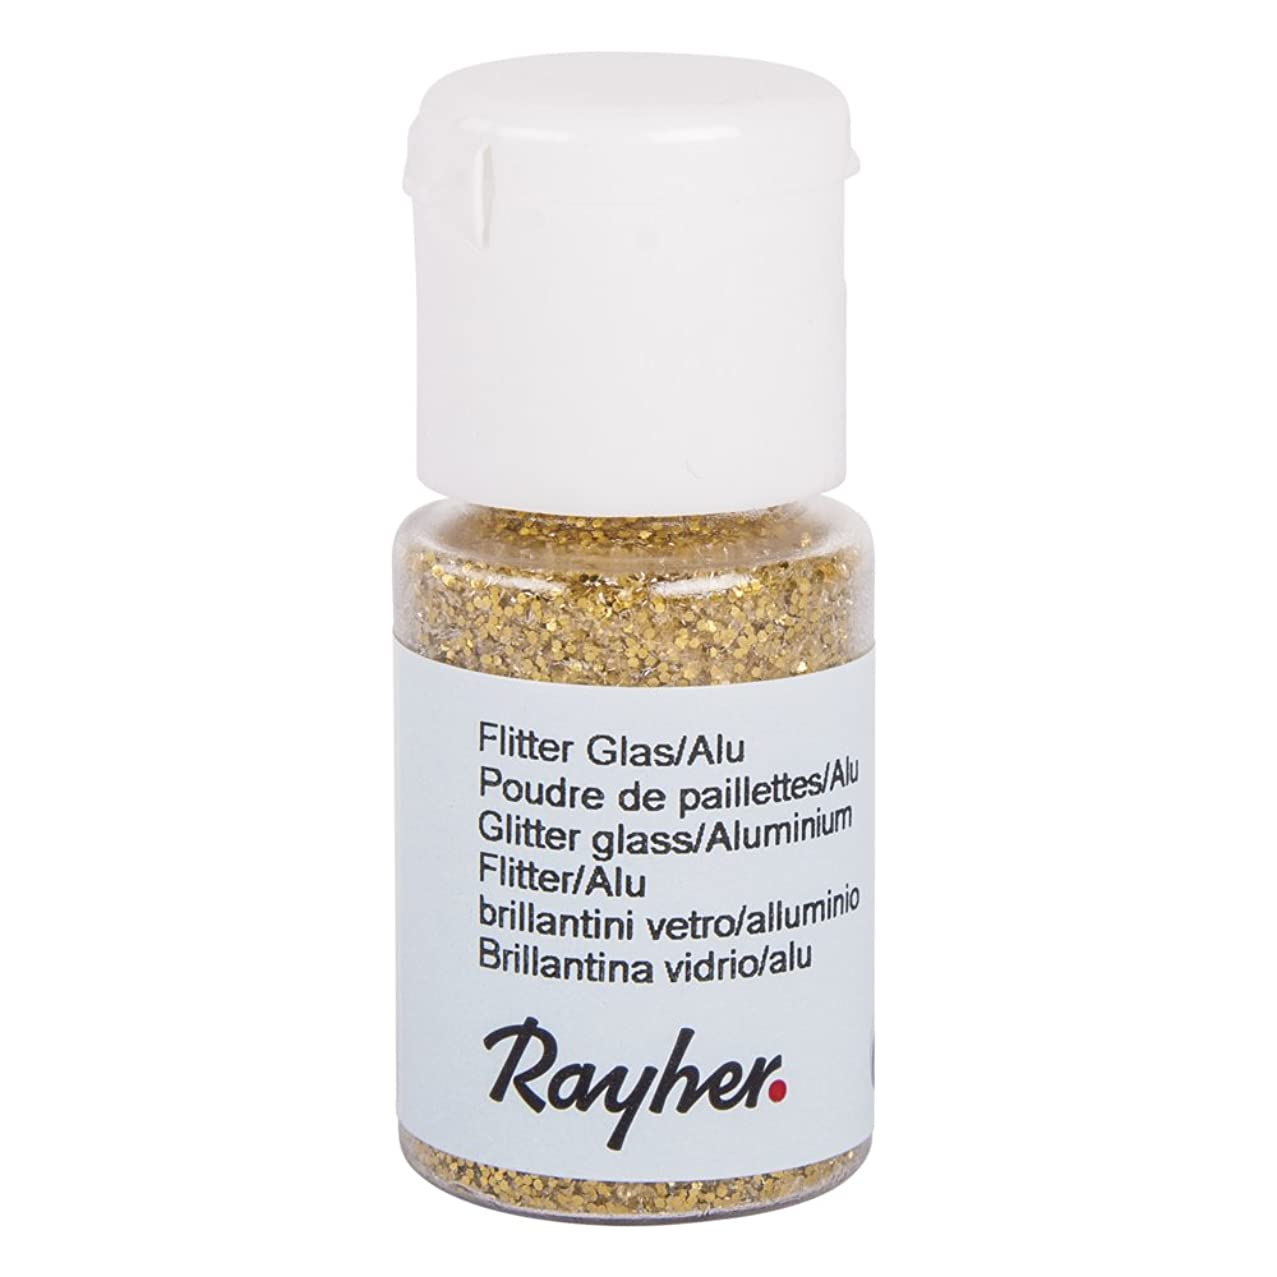 RAYHER 3925106?Glitter Glass/Aluminium Small Fl? ¤ Schchen 10?ml, Gold